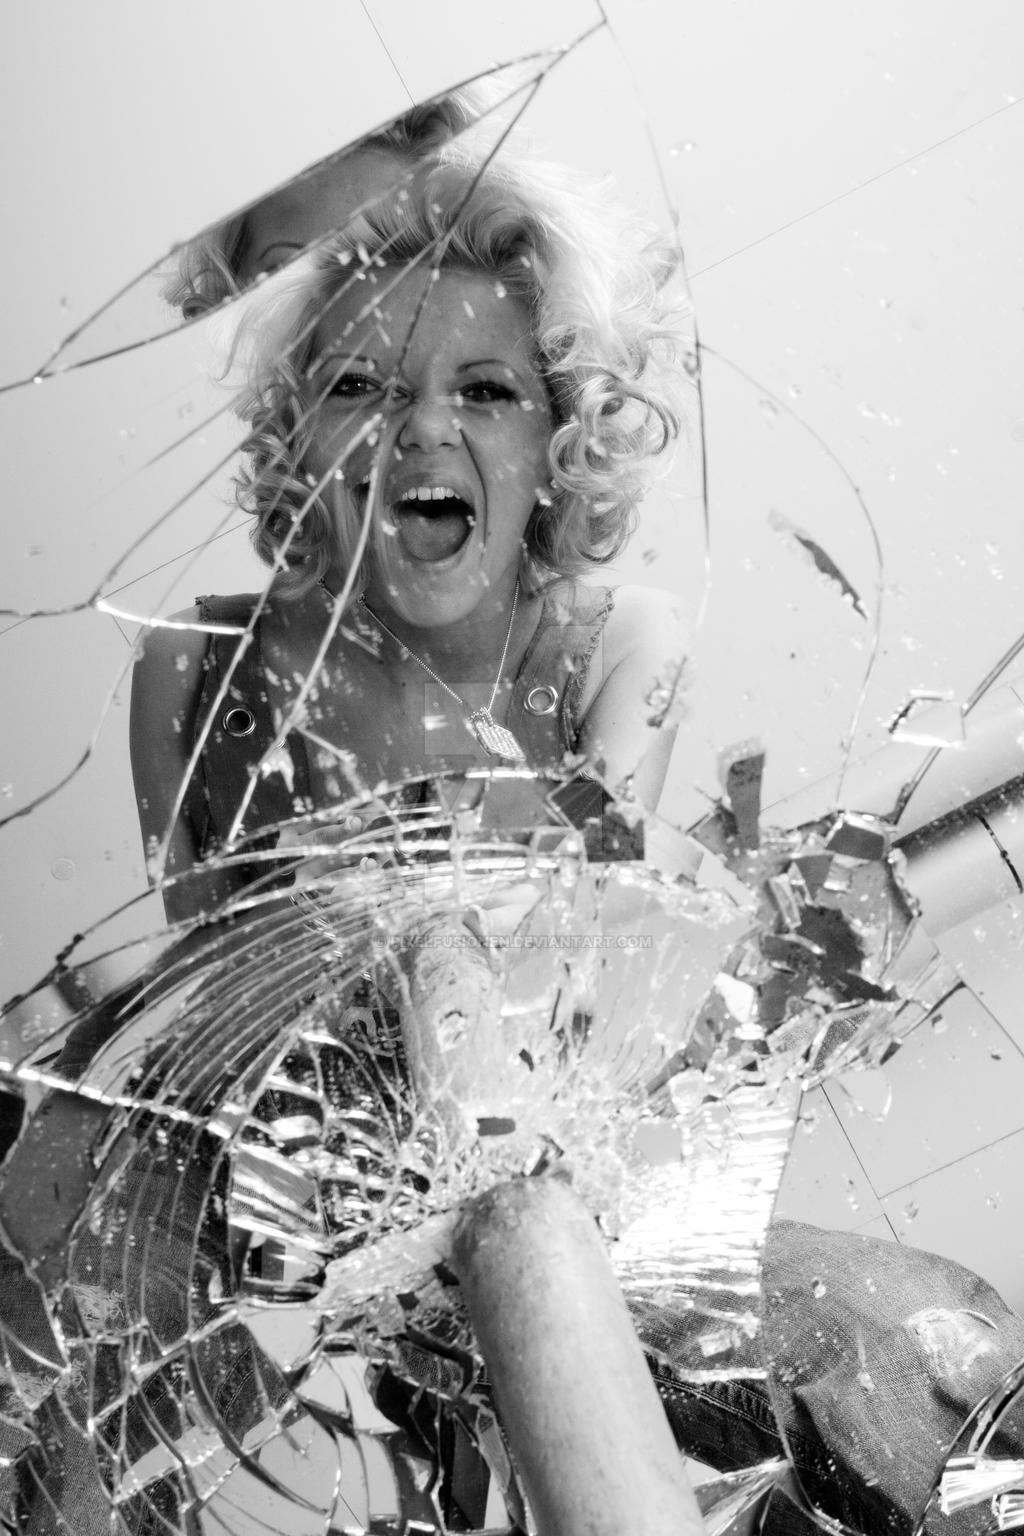 Broken mirror by pixelfusionen on deviantart for Broken mirror art